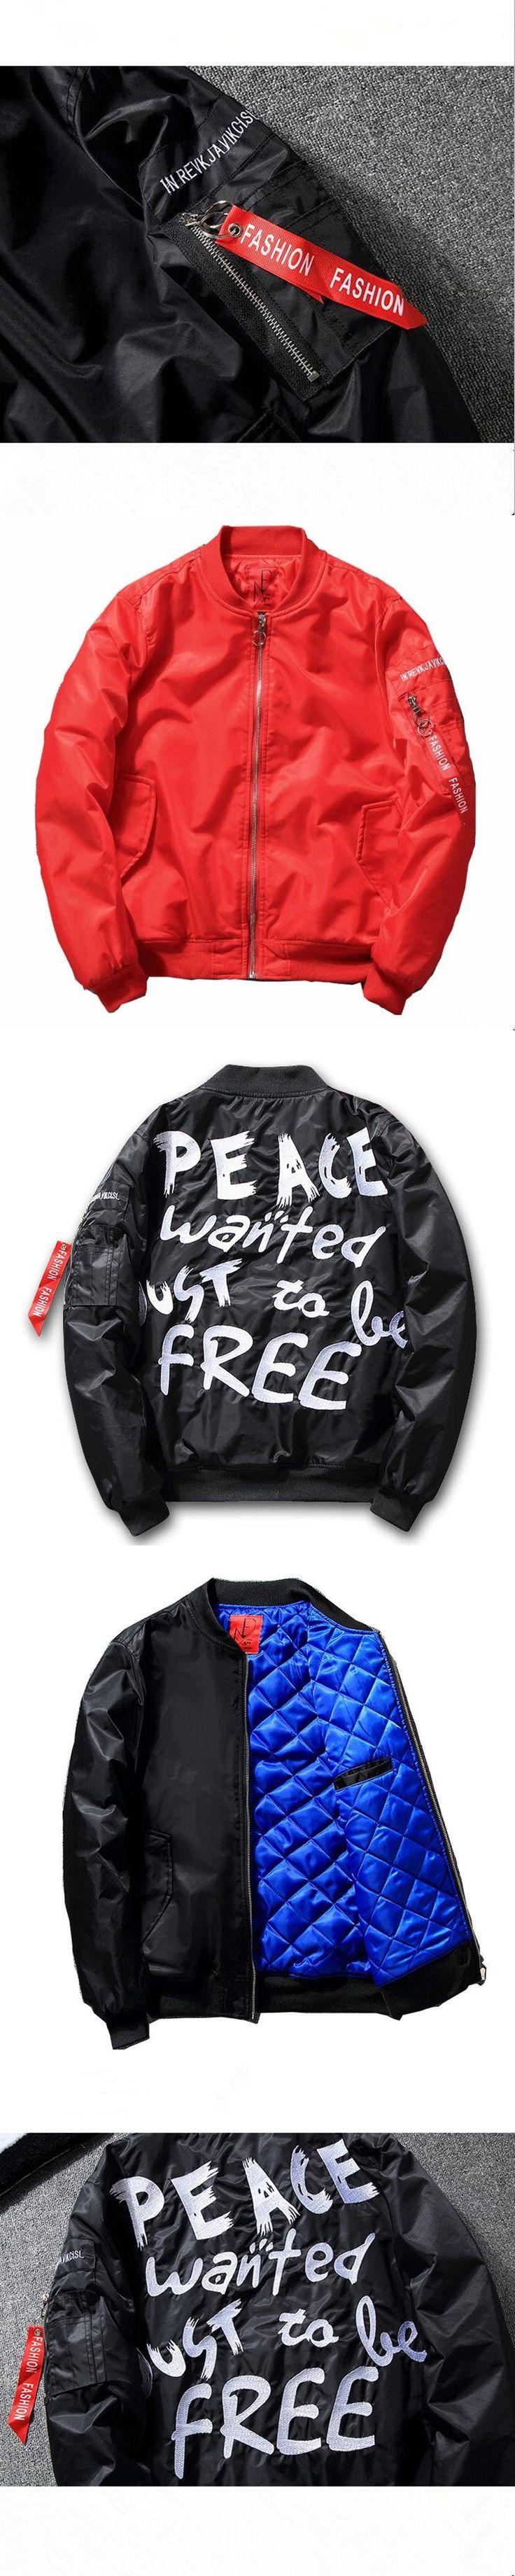 New hip-hop men's coats for 2018  Autumn Winter DJ Bomber Jacket Thick Peace Print Men Jackets Coat Mens Bomber Ma1 Jacket